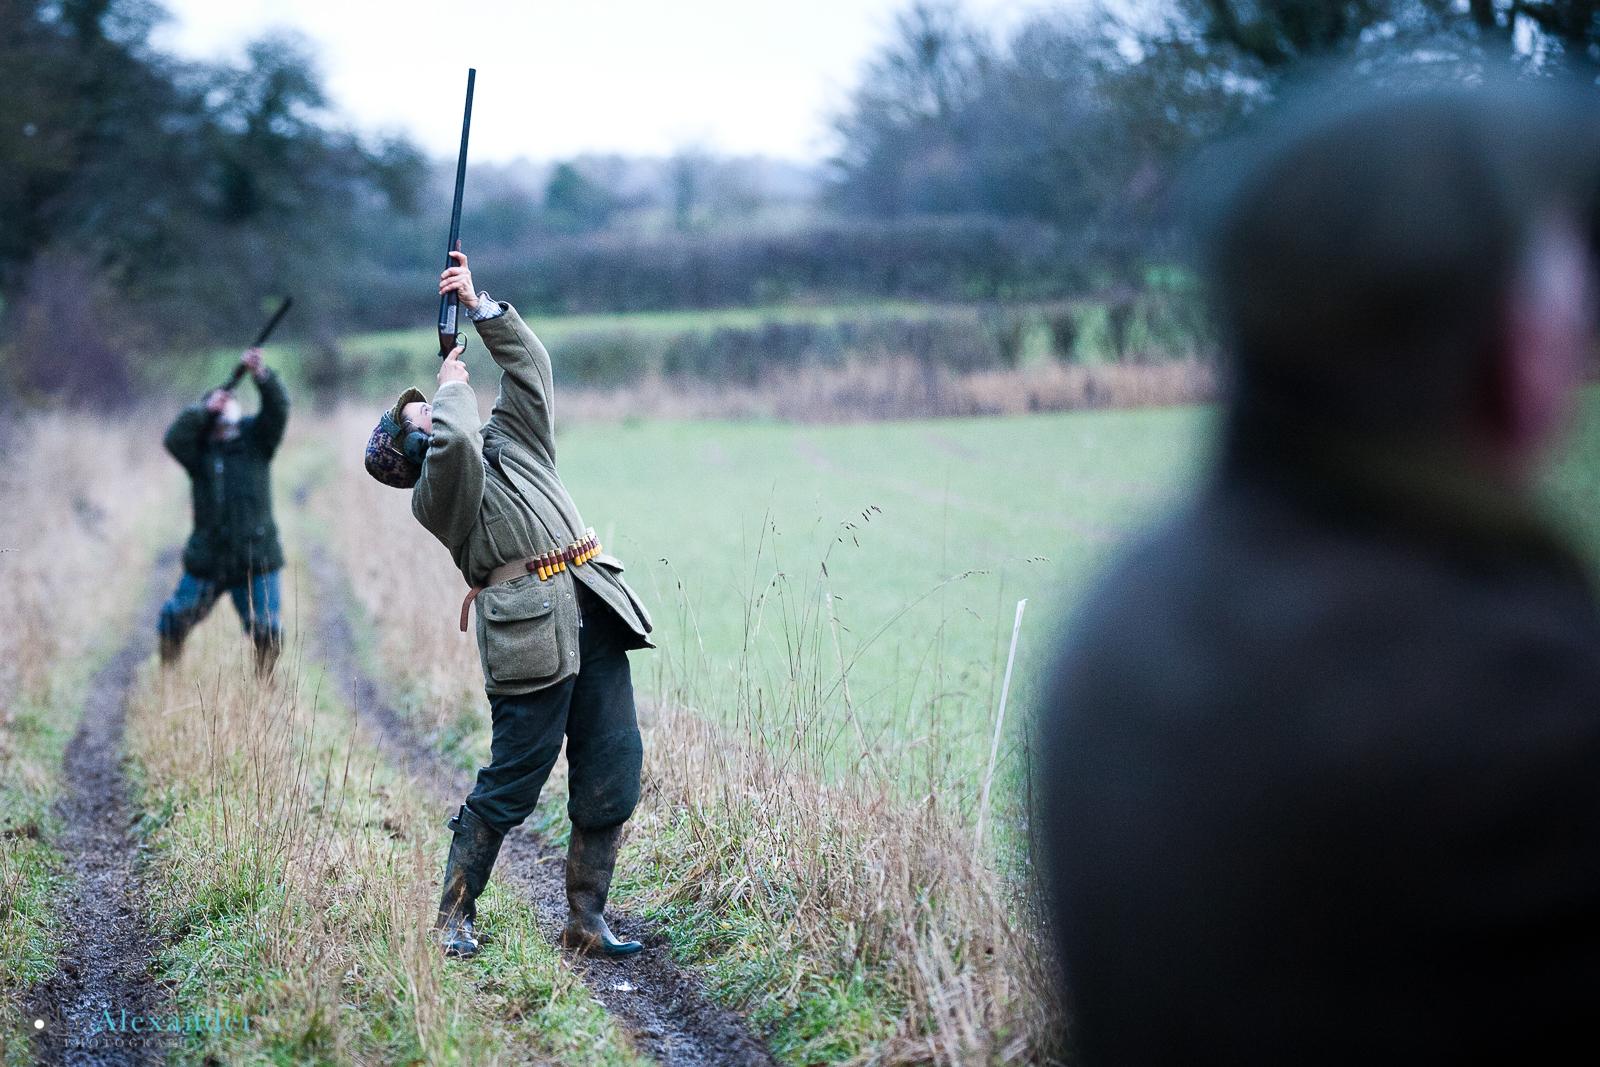 looking down the line of guns shooting pheasants